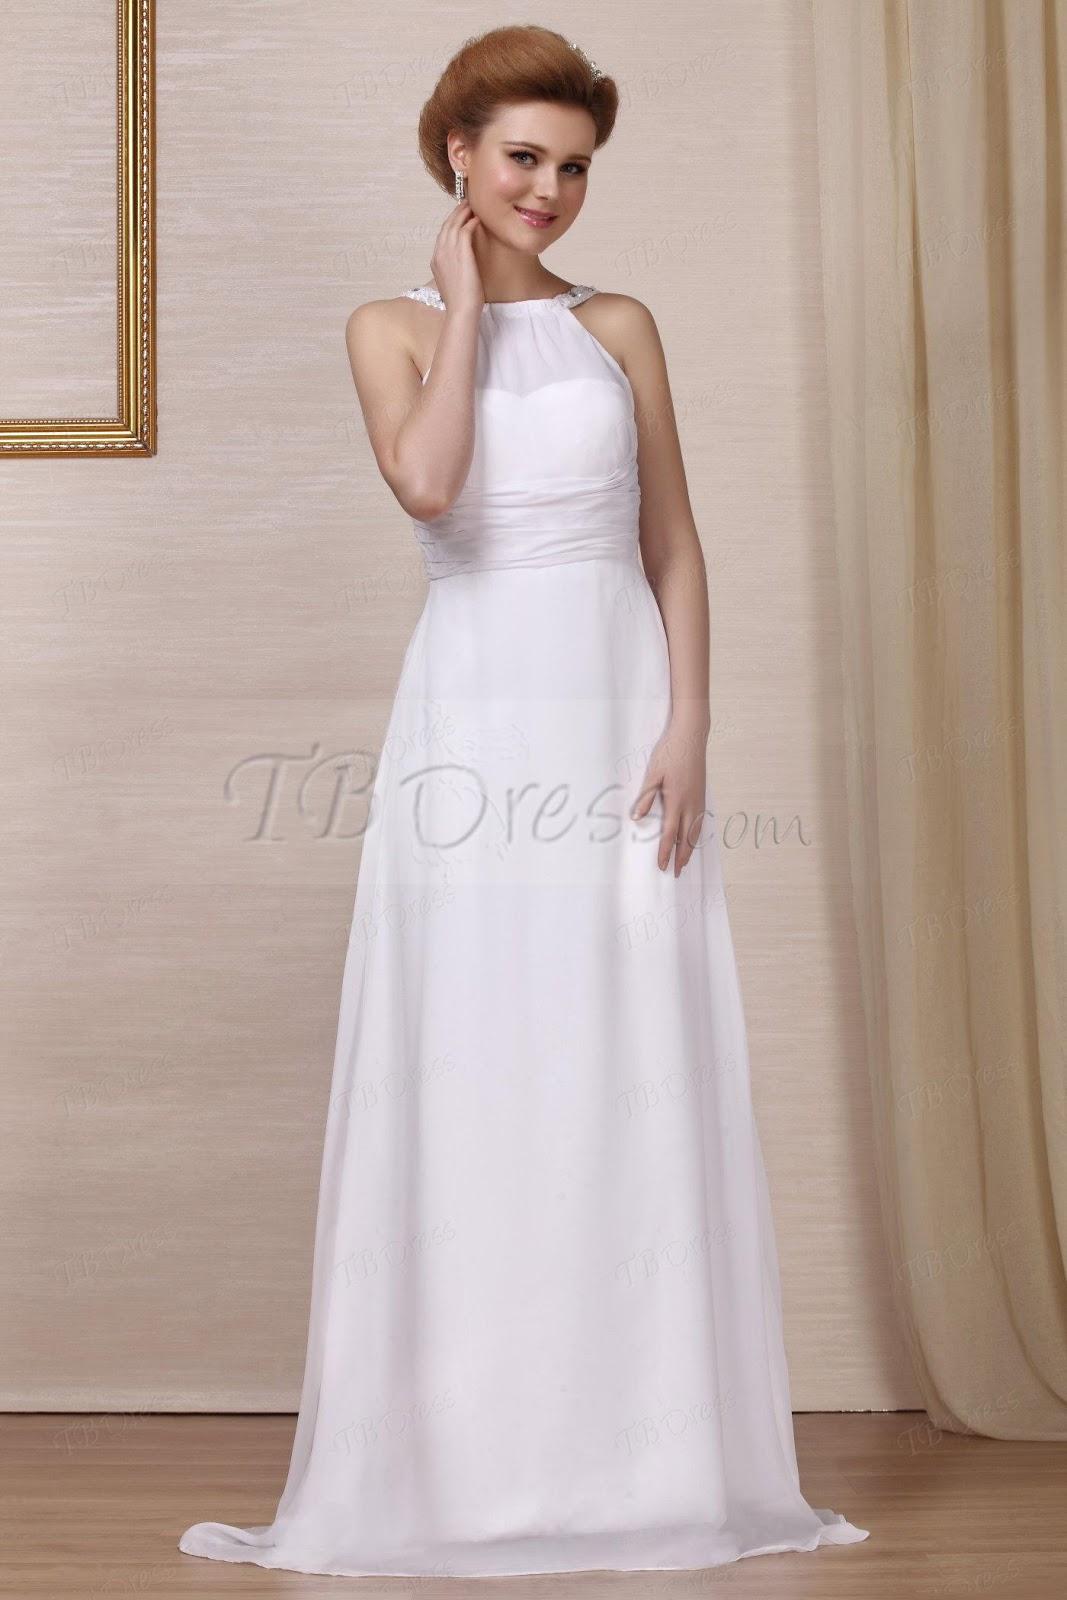 Plus Size Wedding Dresses Miami : Wedding dresses for older women